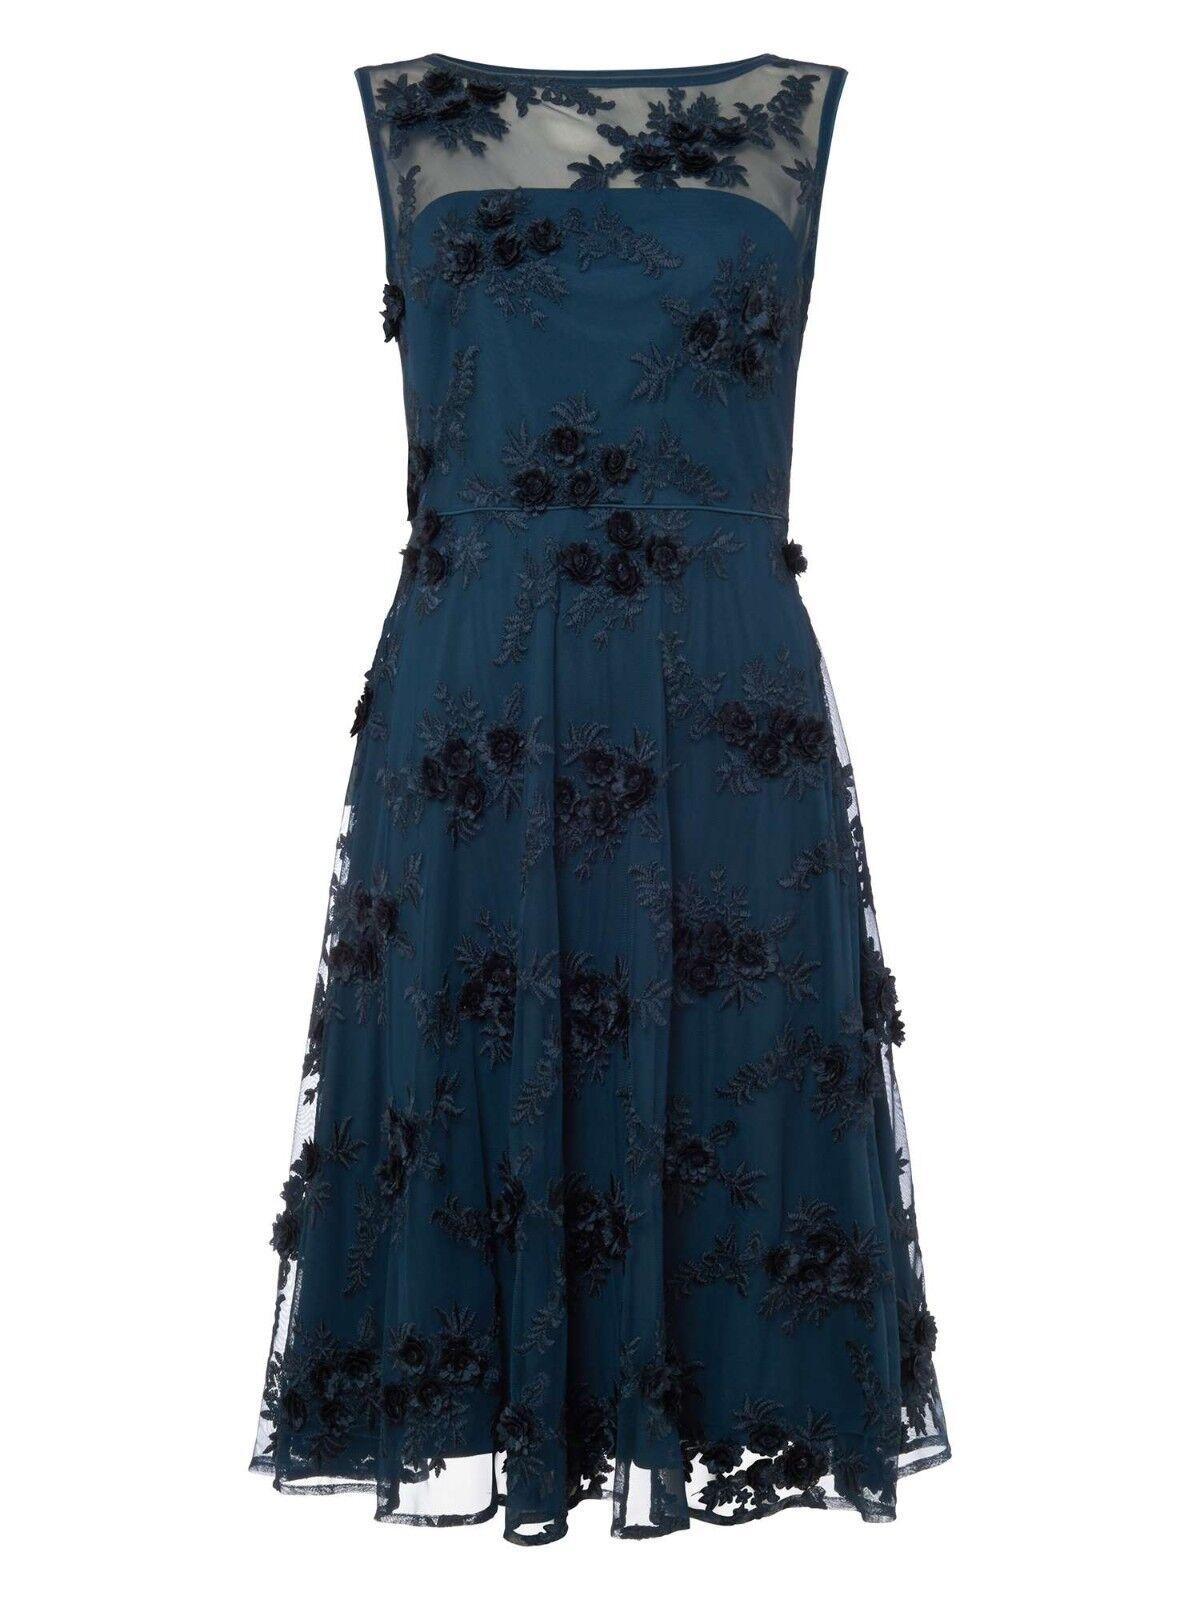 New Phase Eight Petrol Deidra Embroiderot Dress Sz UK 10 rrp